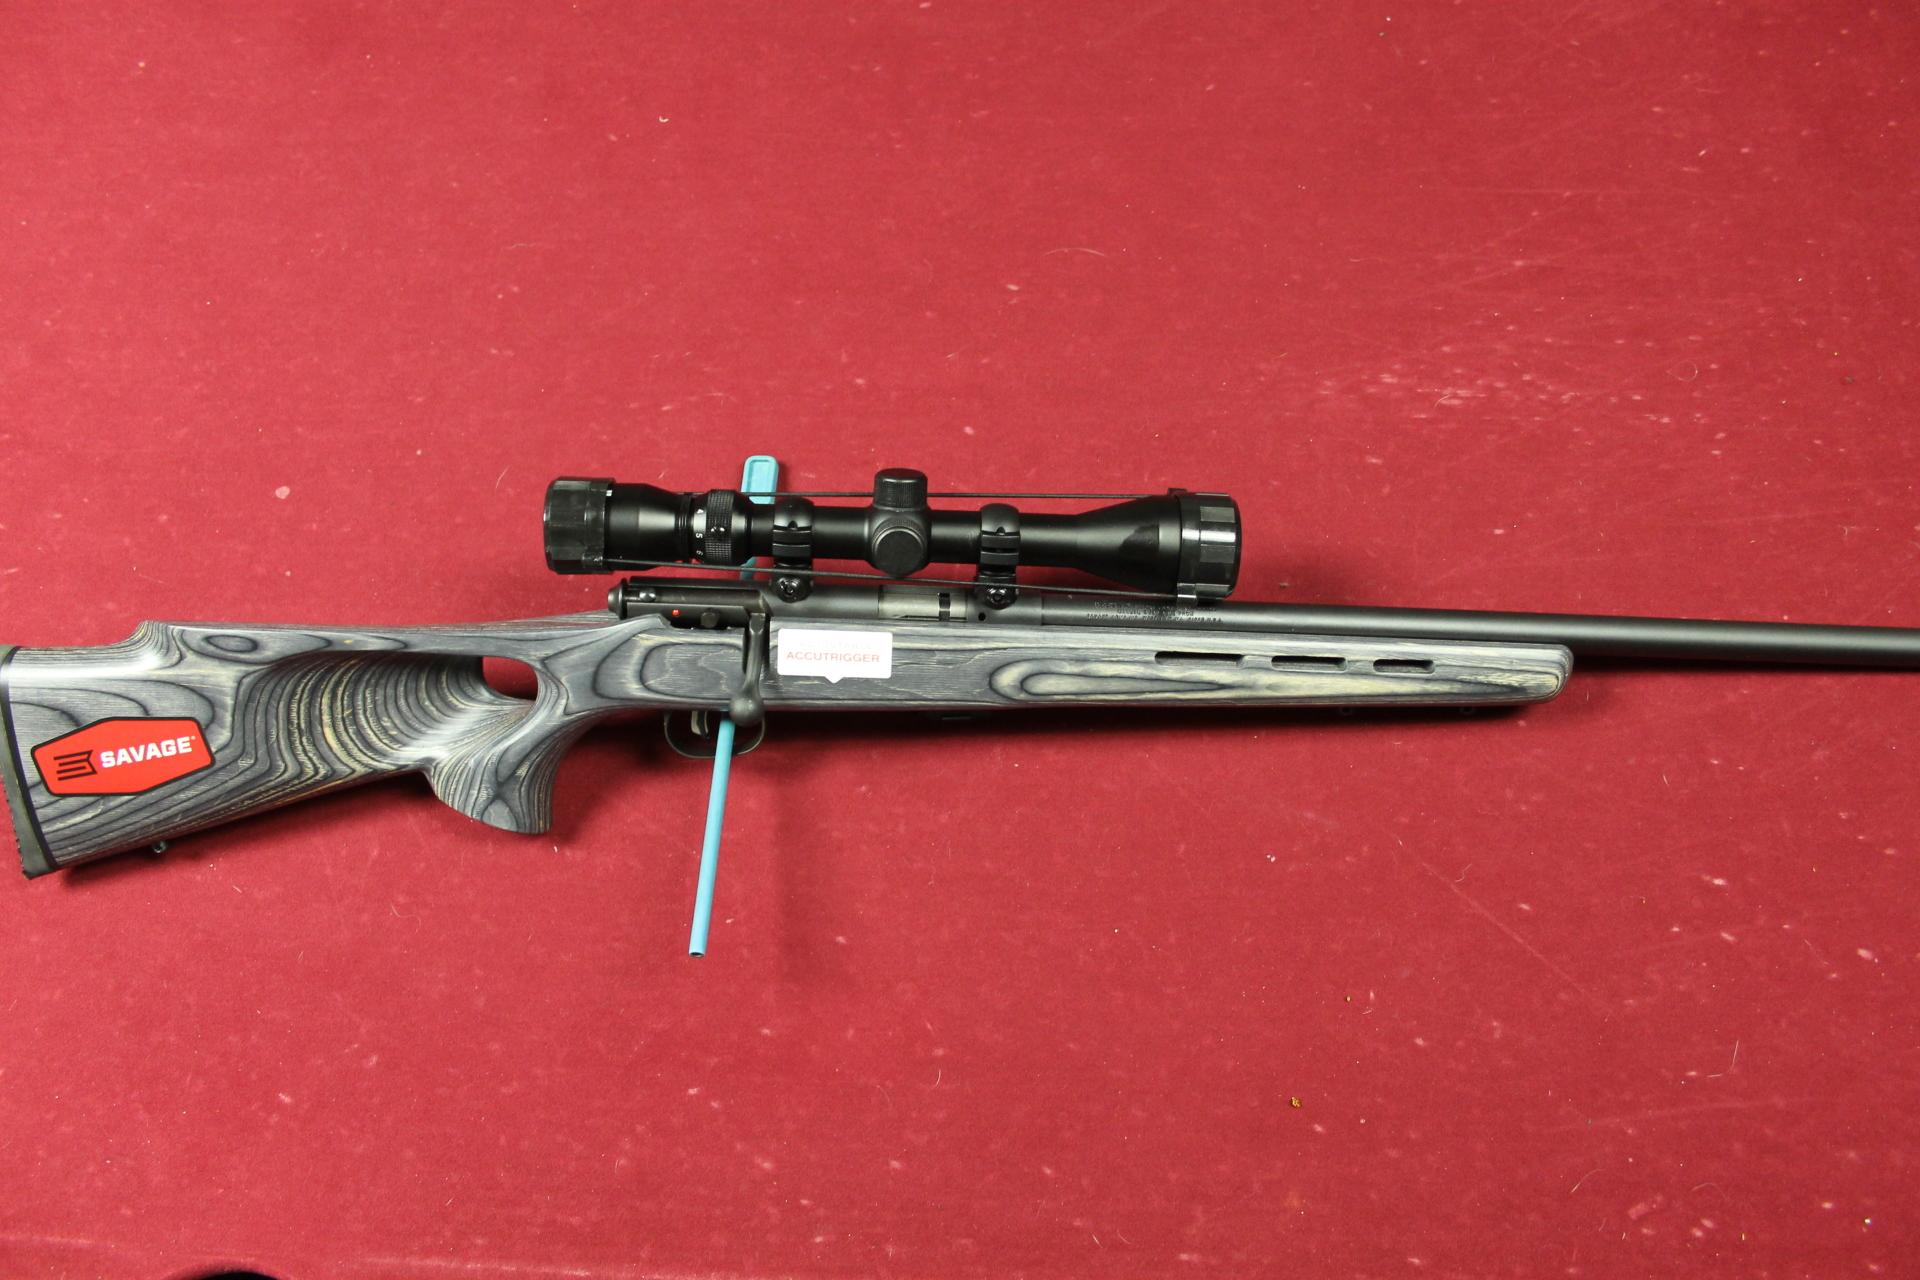 SAVAGE ARMS MARK II BTVXP 22 LR W 3-9X32 SCOPE $325.00